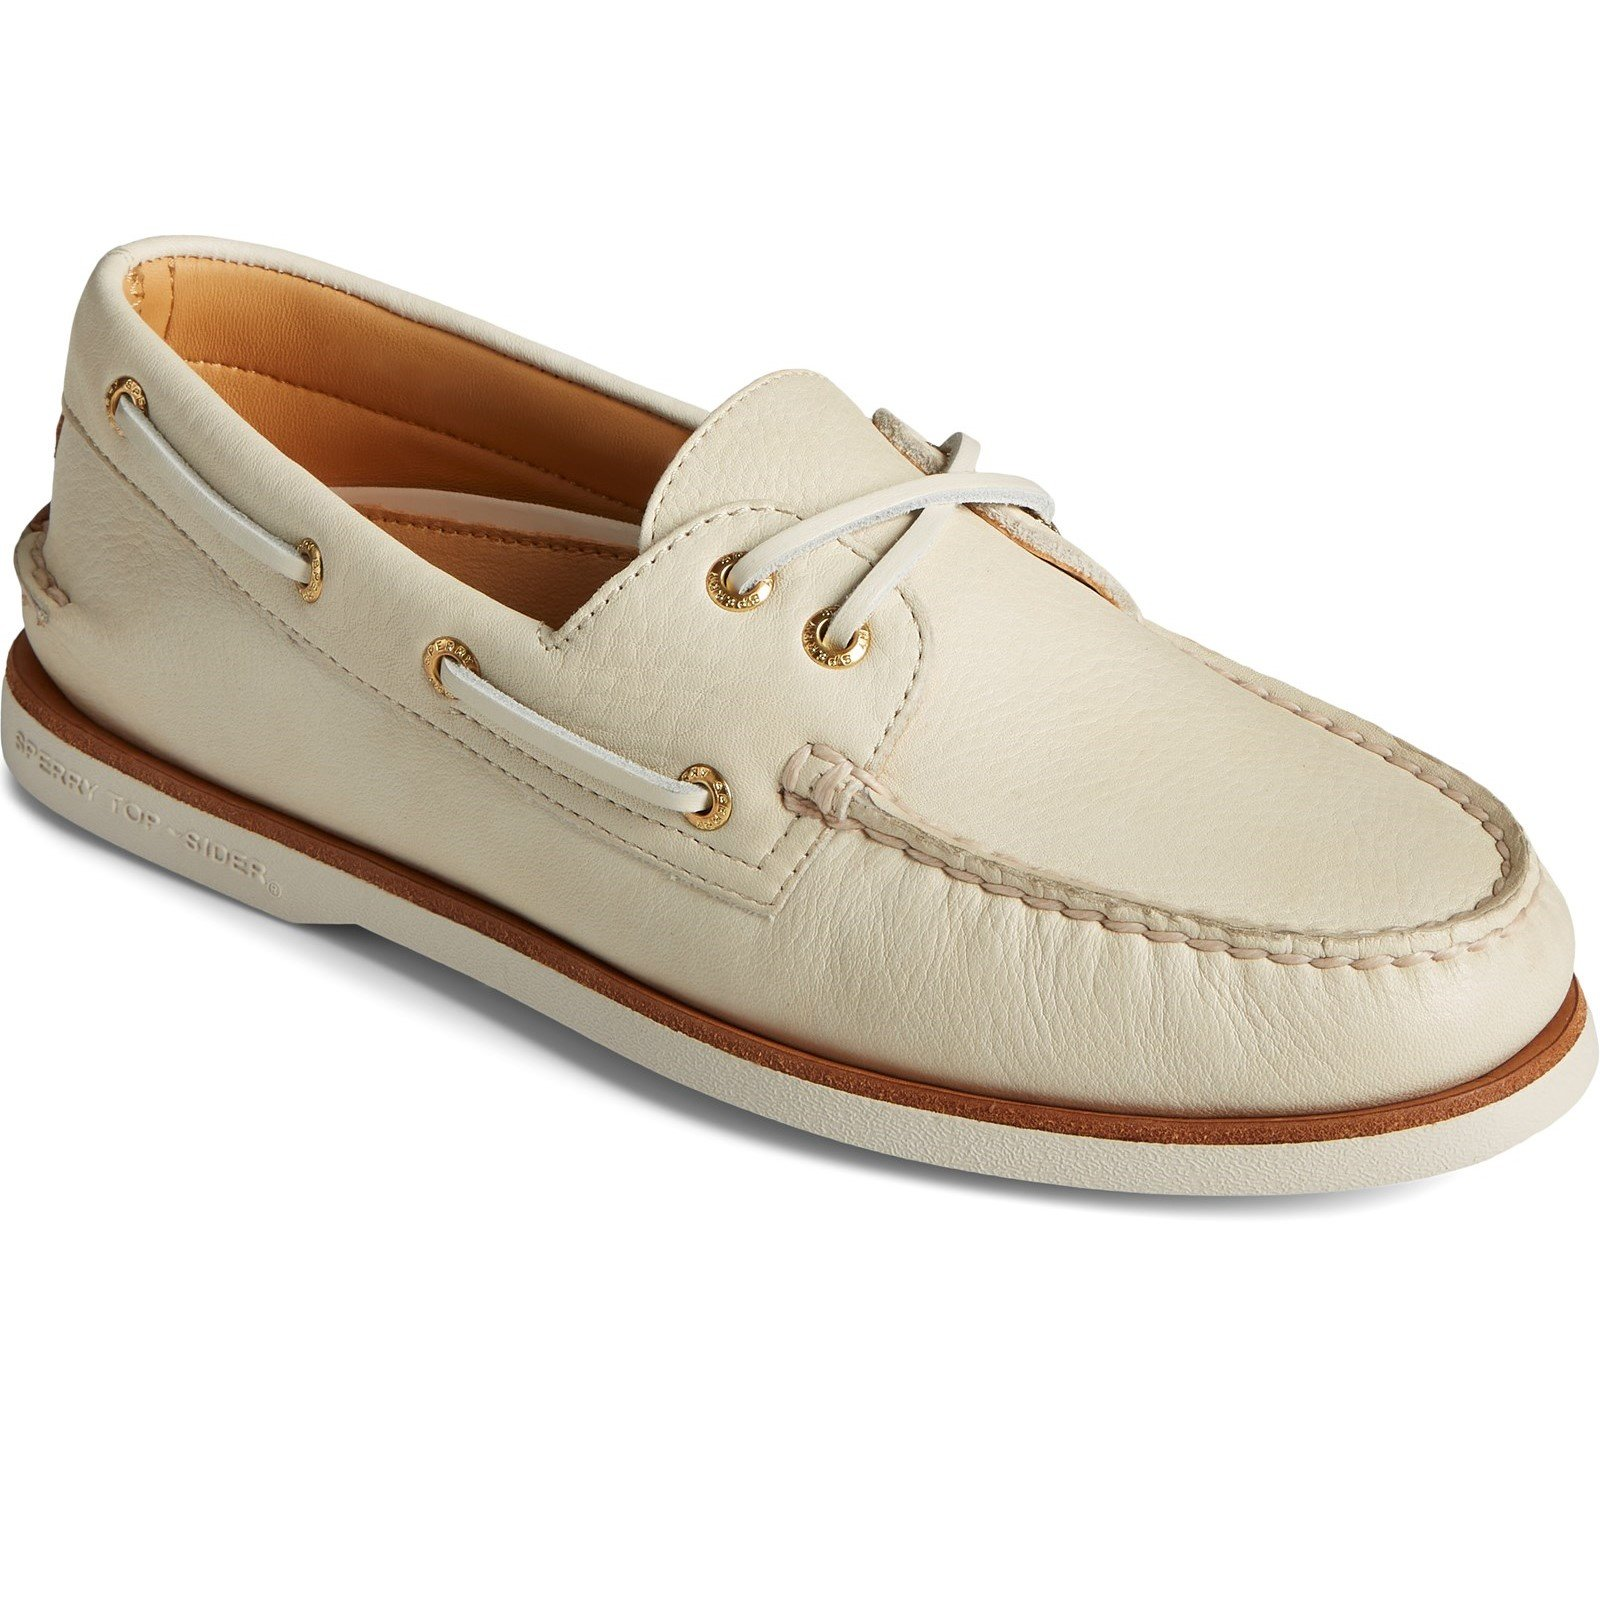 Sperry Men's A/O 2-Eye Boat Shoe Various Colours 32926 - Cream 9.5